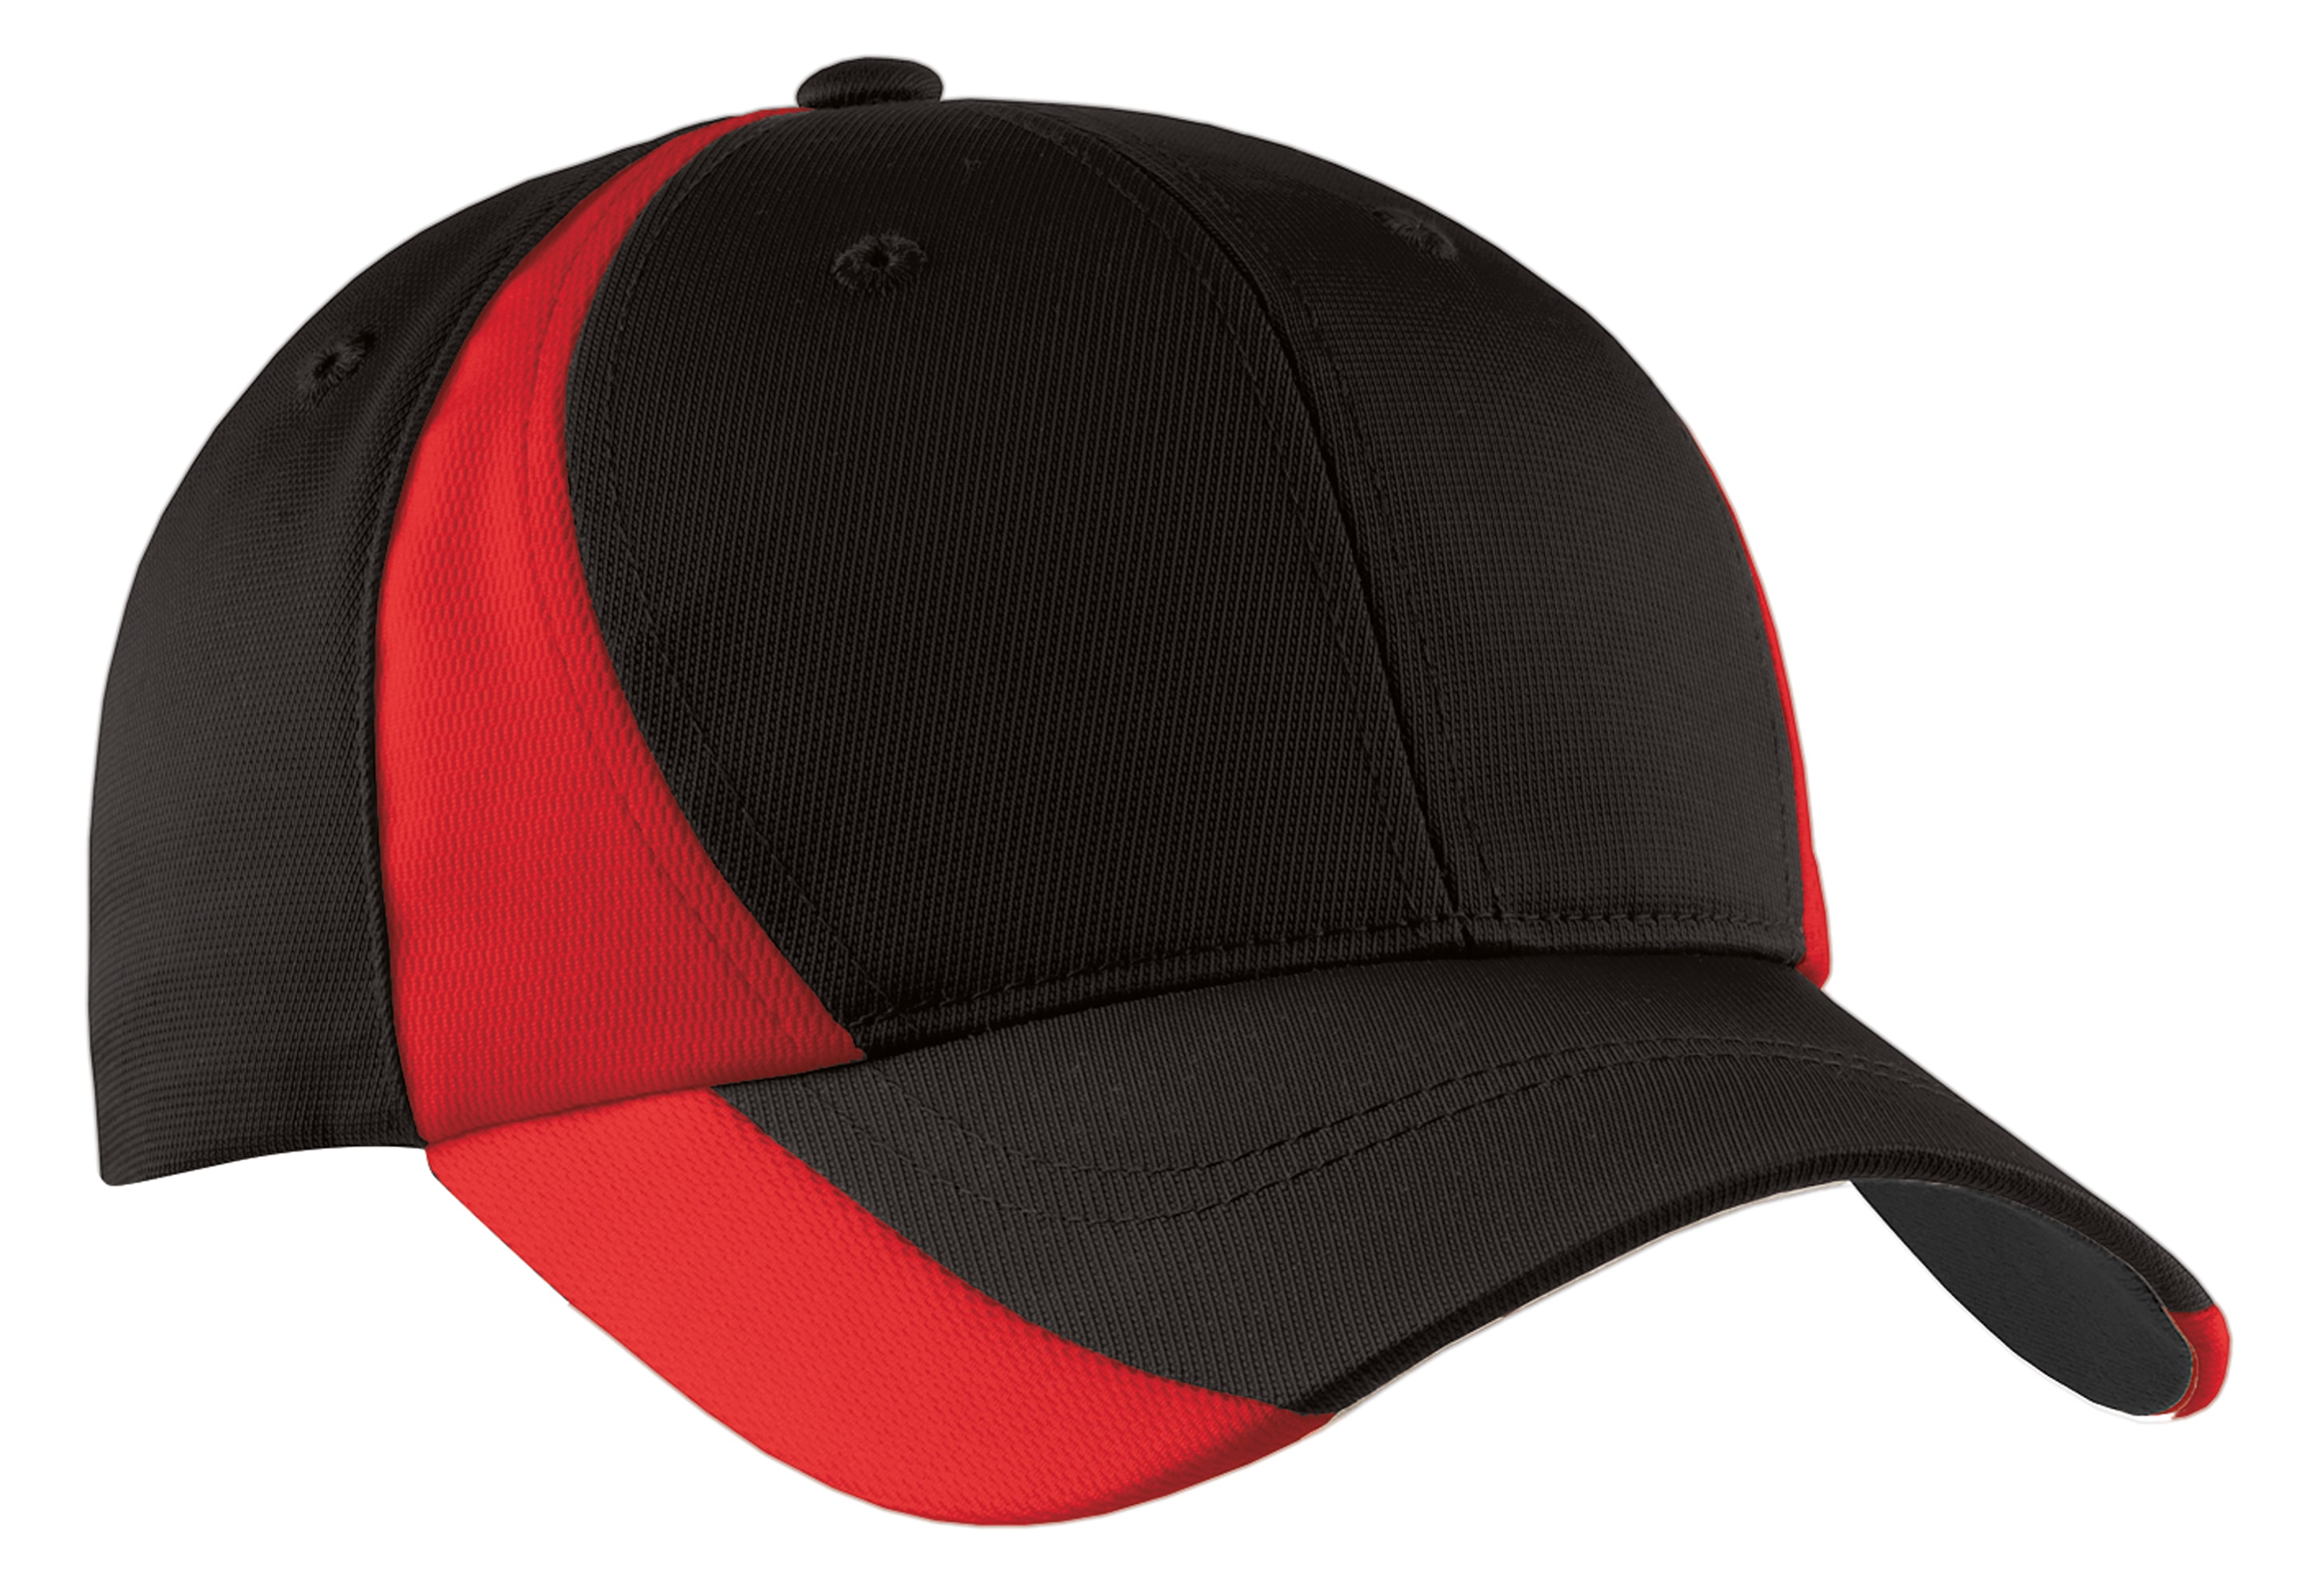 Stc11 Sport Tek Dry Zone Nylon Colorblock Cap Shop a variety of ball caps, beanies, flat brim hats, headbands, and visors. stc11 sport tek dry zone nylon colorblock cap